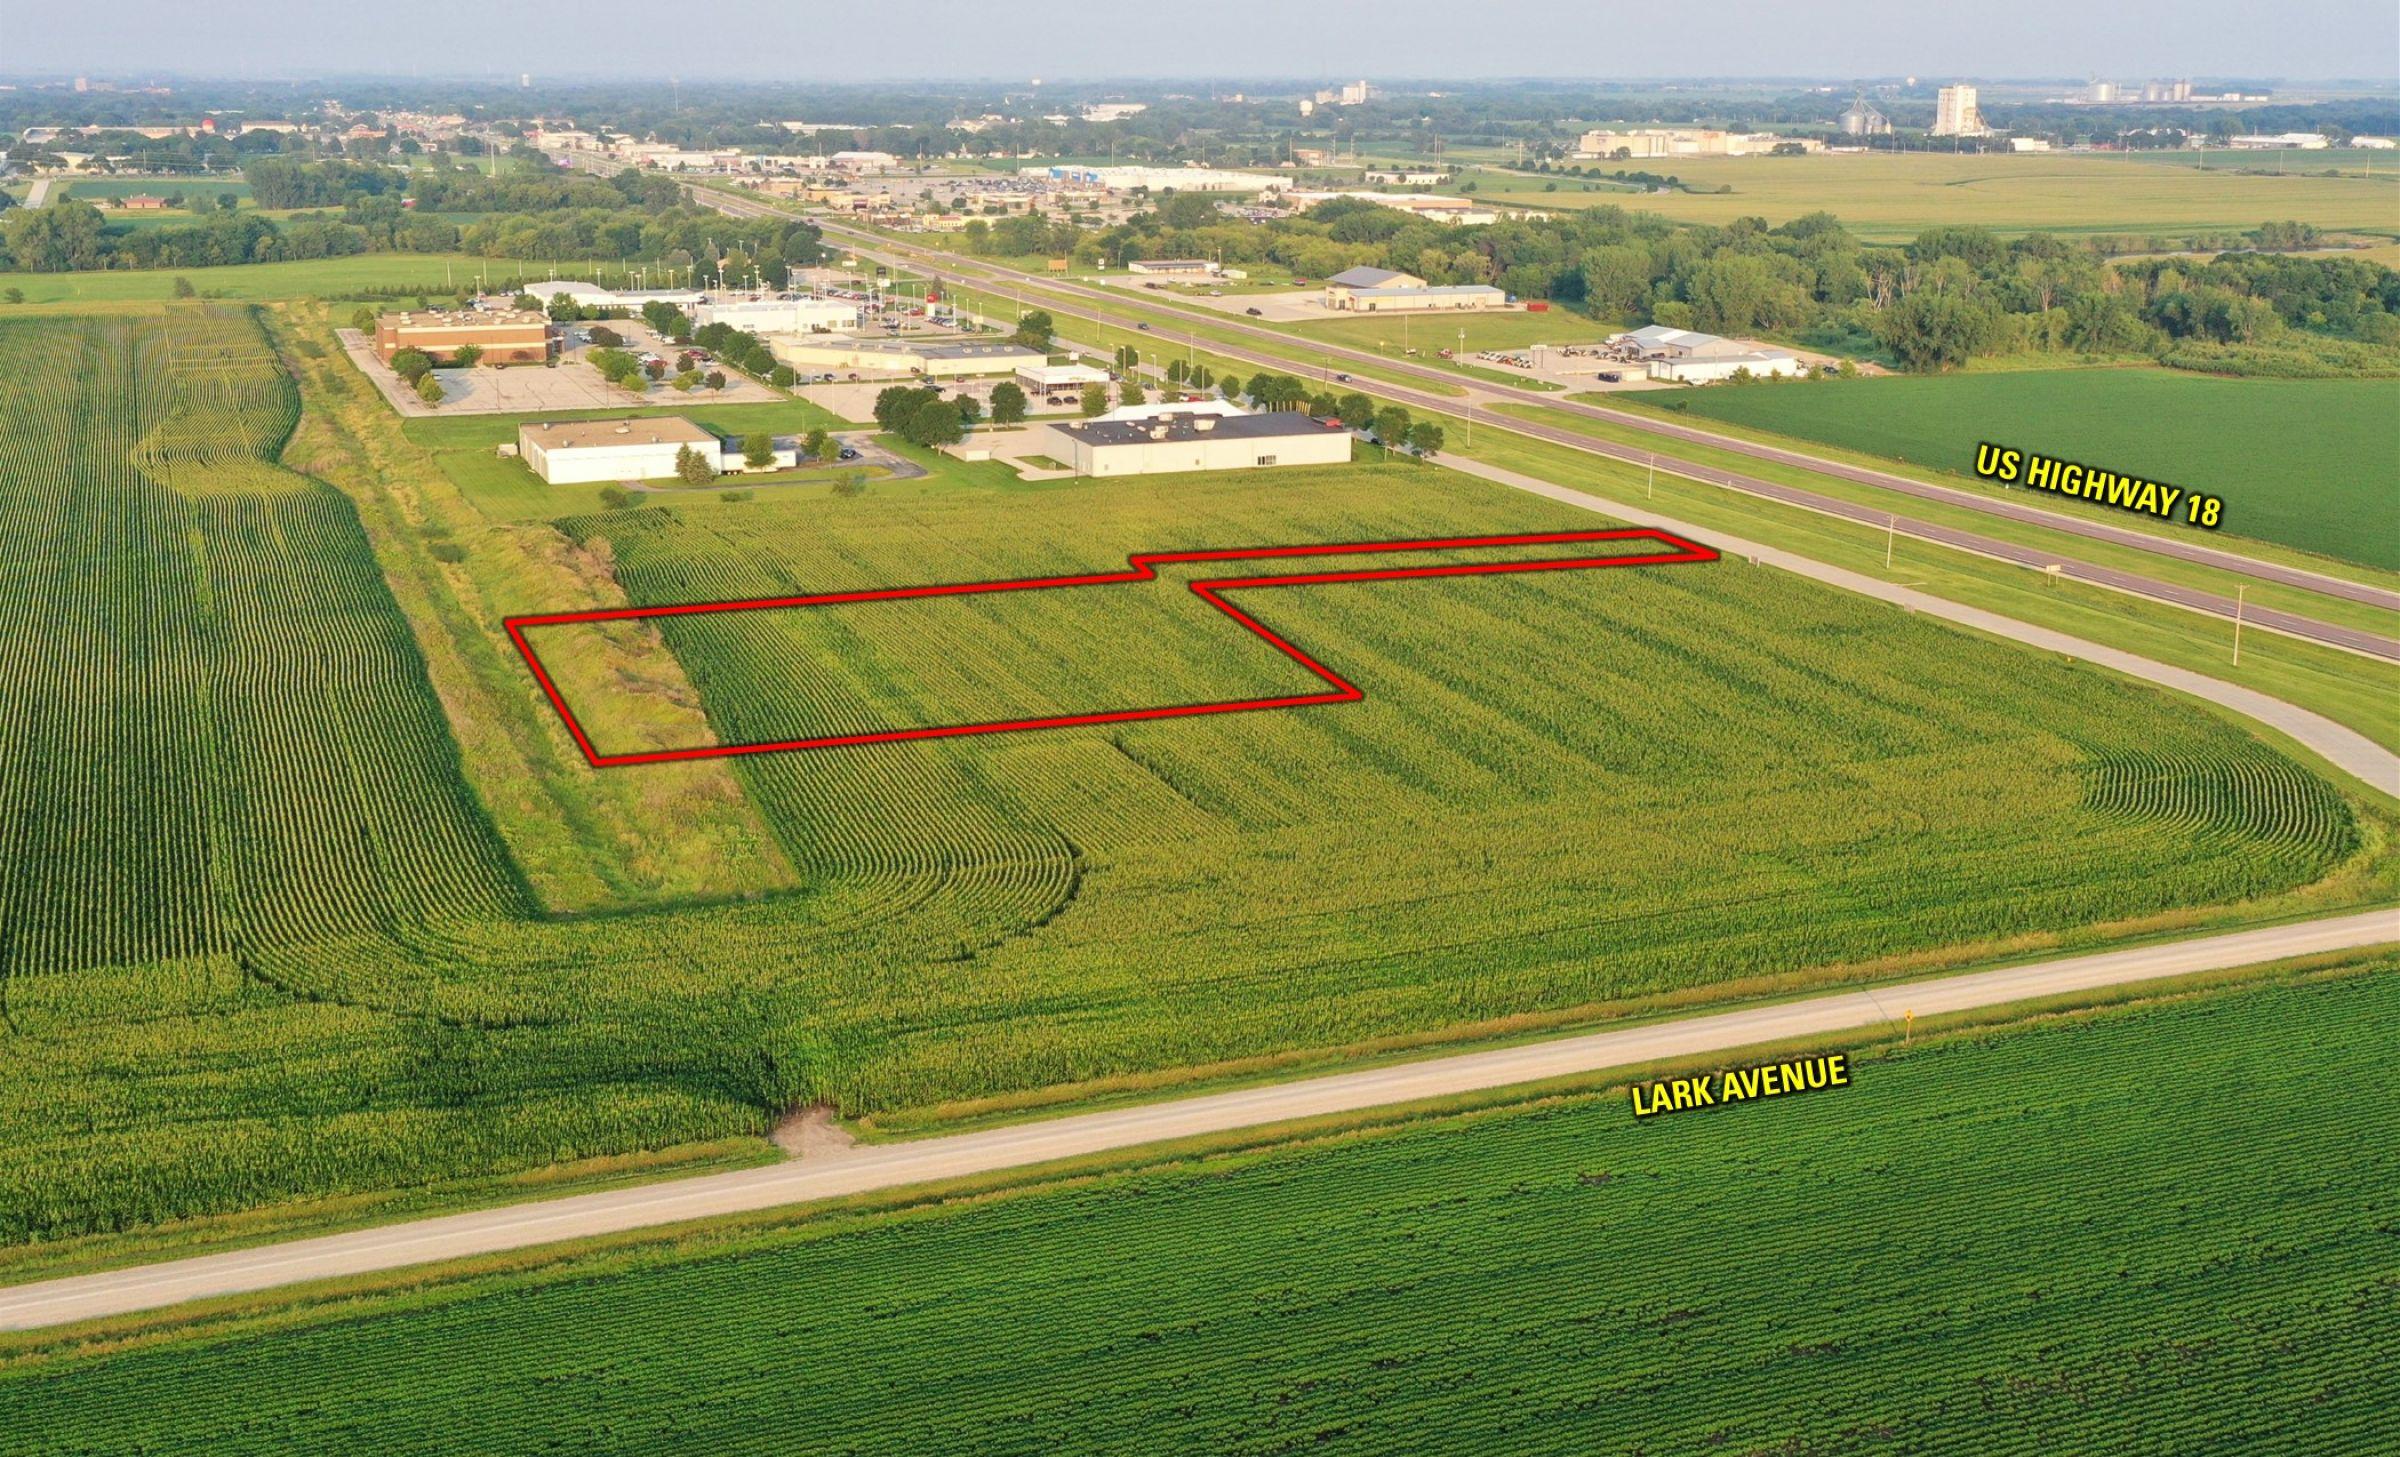 development-land-commercial-cerro-gordo-county-iowa-2-acres-listing-number-15643-2-2021-07-20-031618.jpg